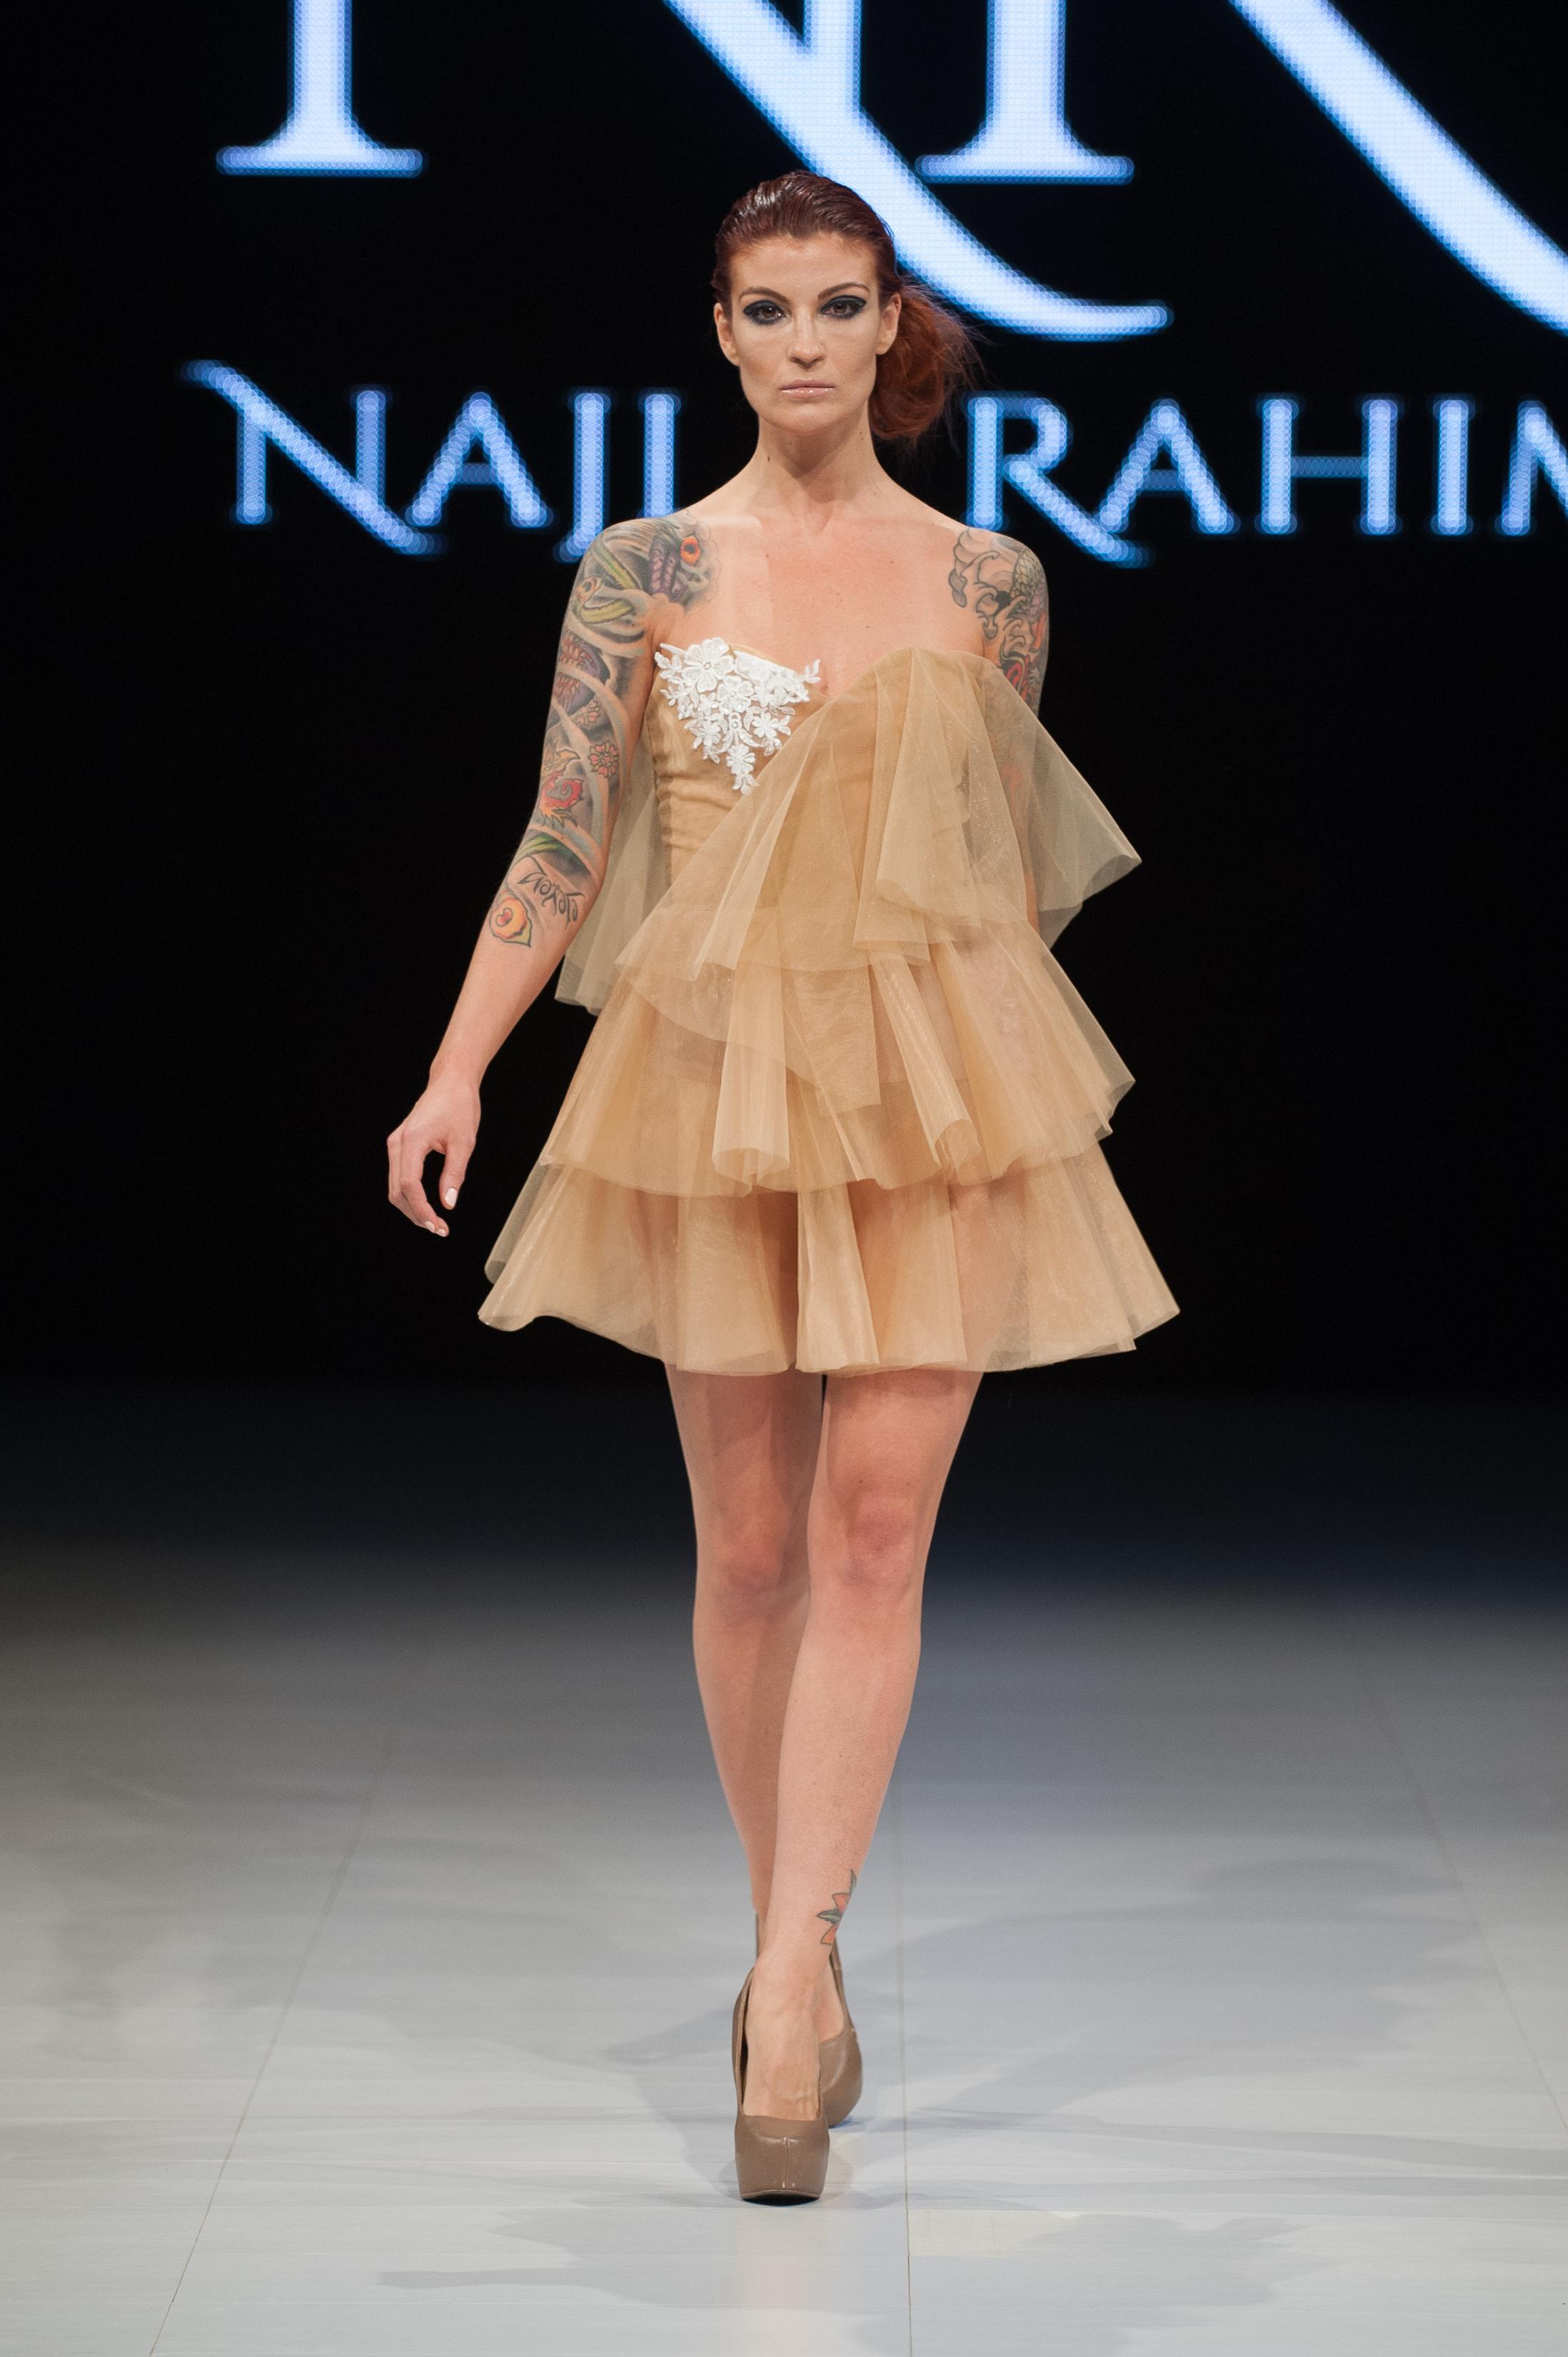 FAT2018-Day1-April17-Najla_Rahimi-Runway-Che_Rosales-LARAWAN-6014.jpg